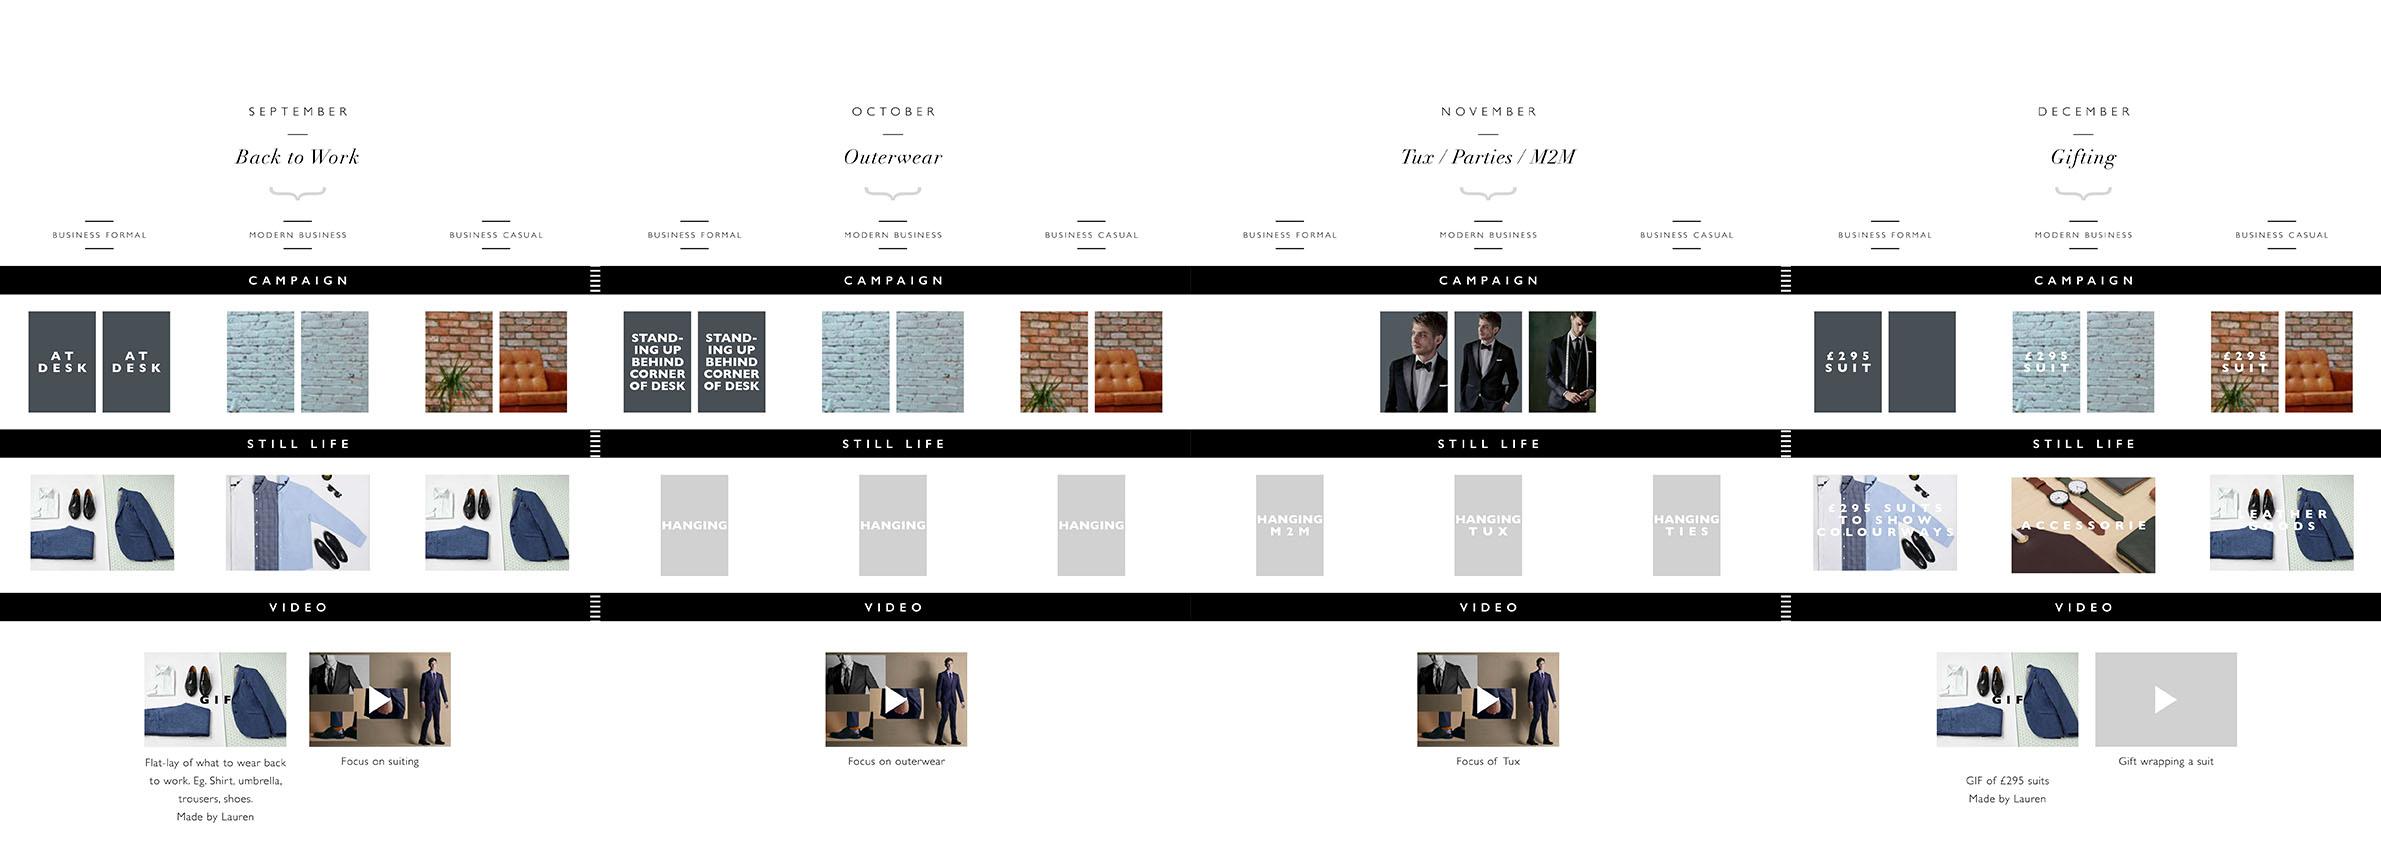 lauren-grace-design-freelance-london-art-direction-fashion-menswear-3.jpg